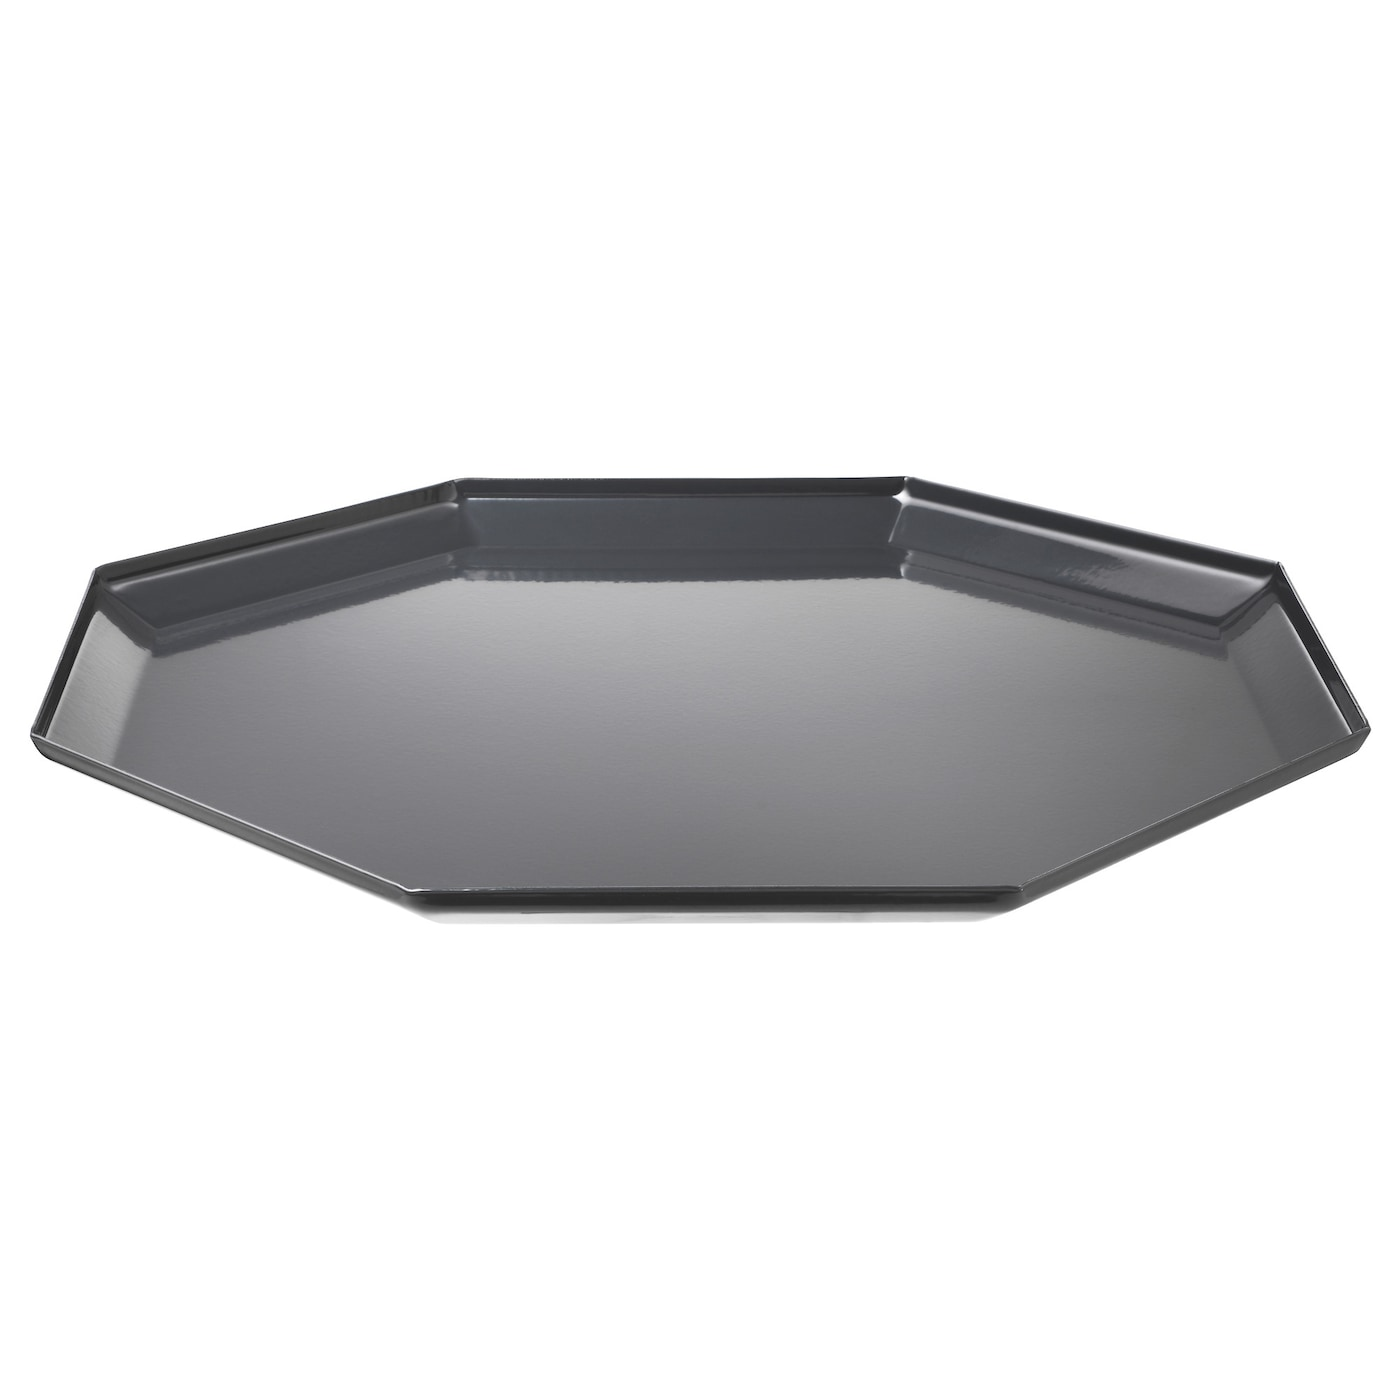 inf nga plat pour bougie gris 26 5 cm ikea. Black Bedroom Furniture Sets. Home Design Ideas